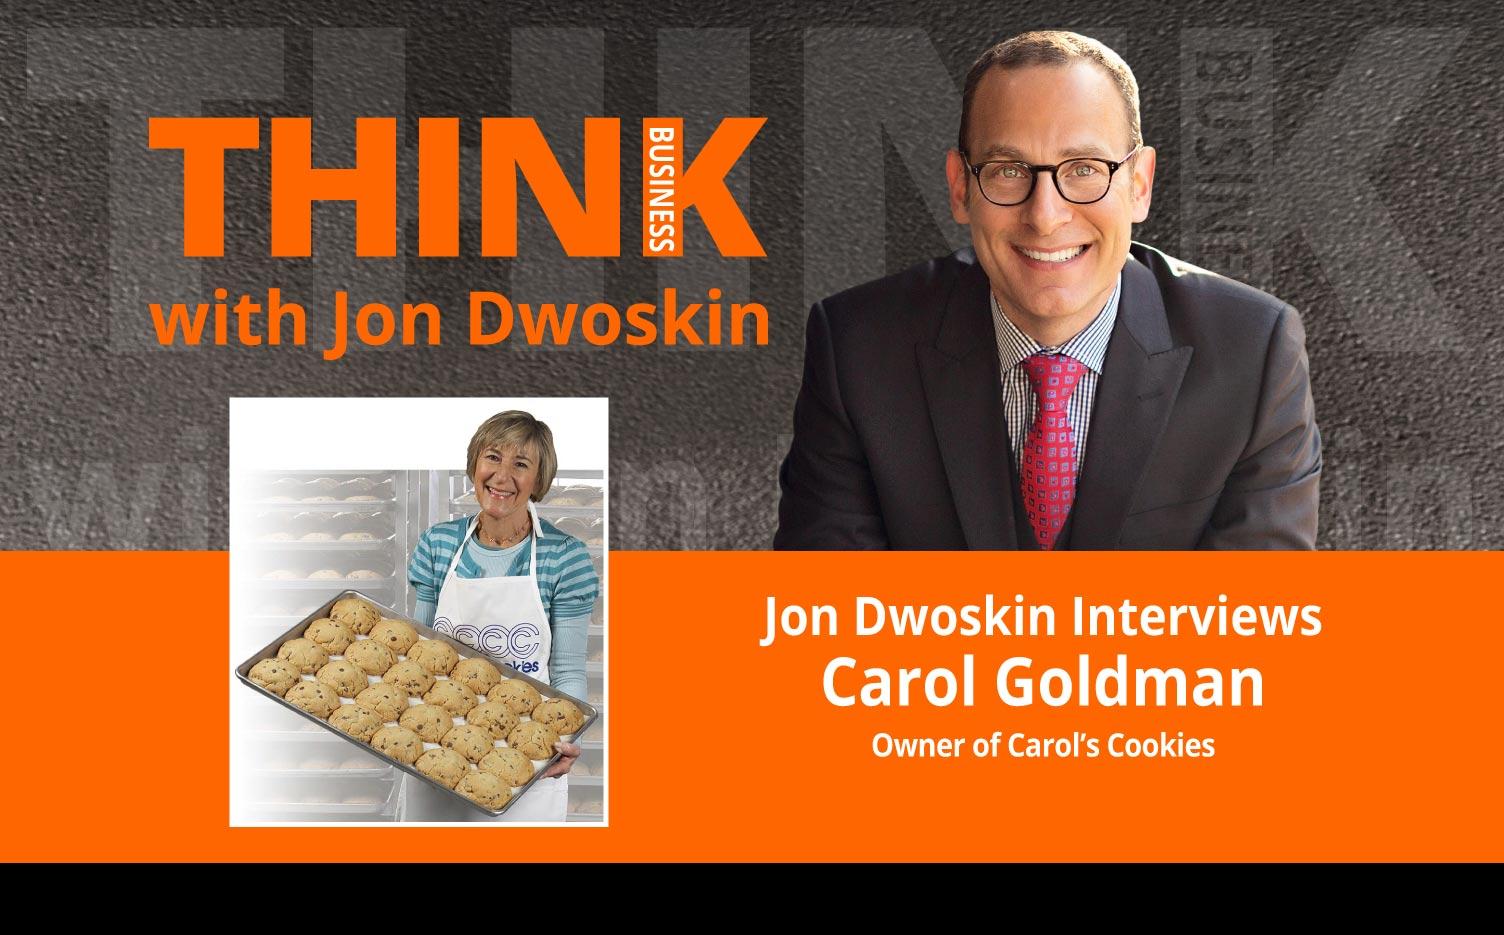 THINK Business Podcast: Jon Dwoskin Interviews Howard Behar